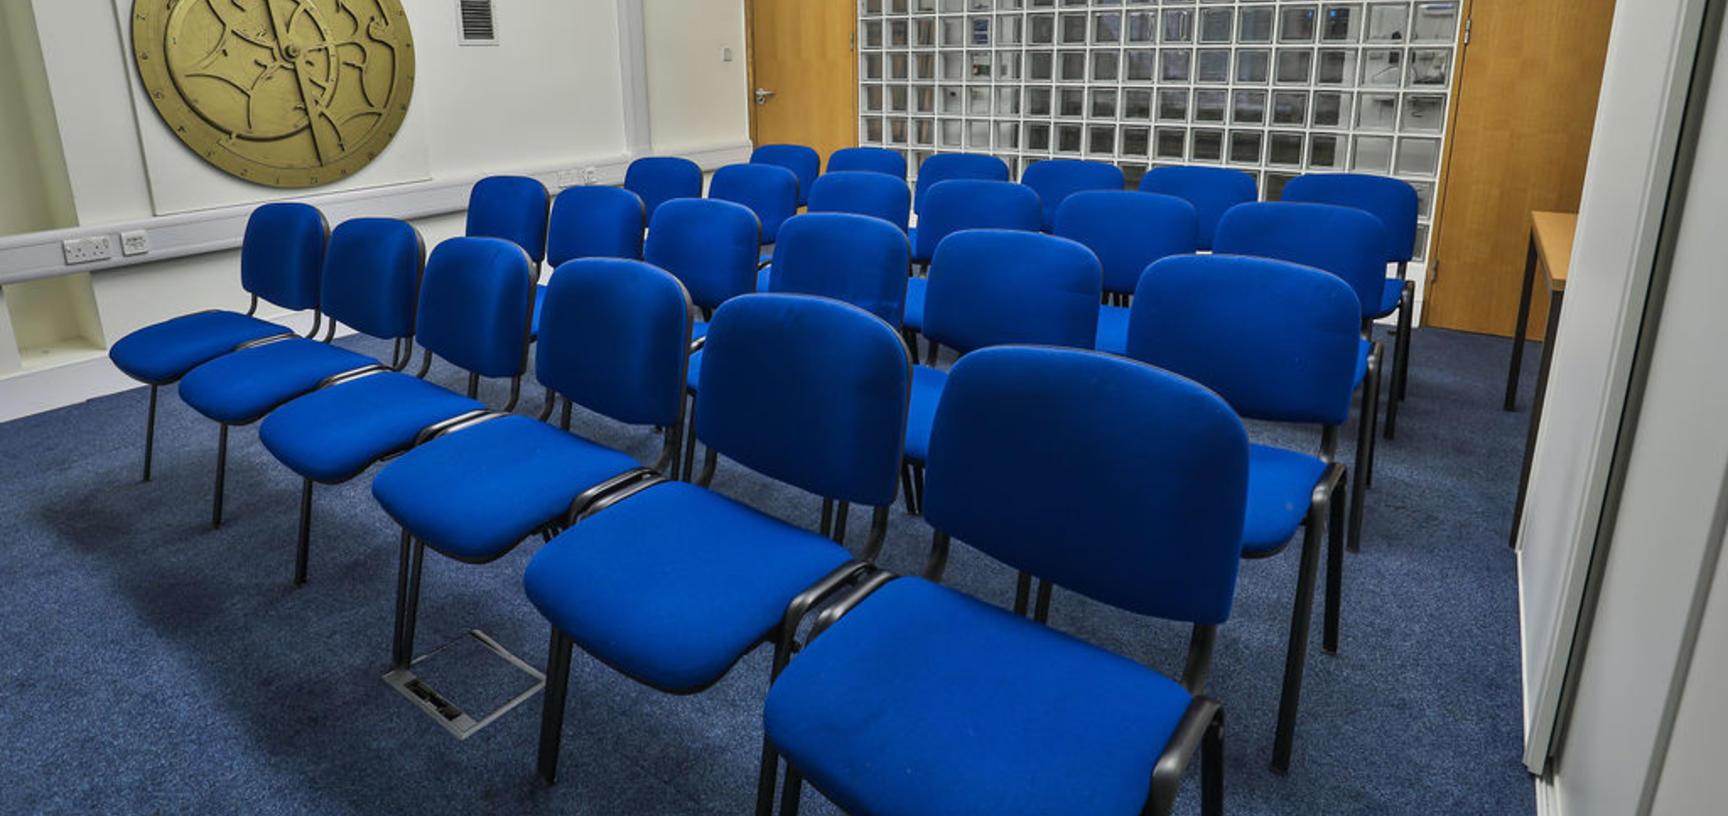 The Seminar Room set up for presentations.